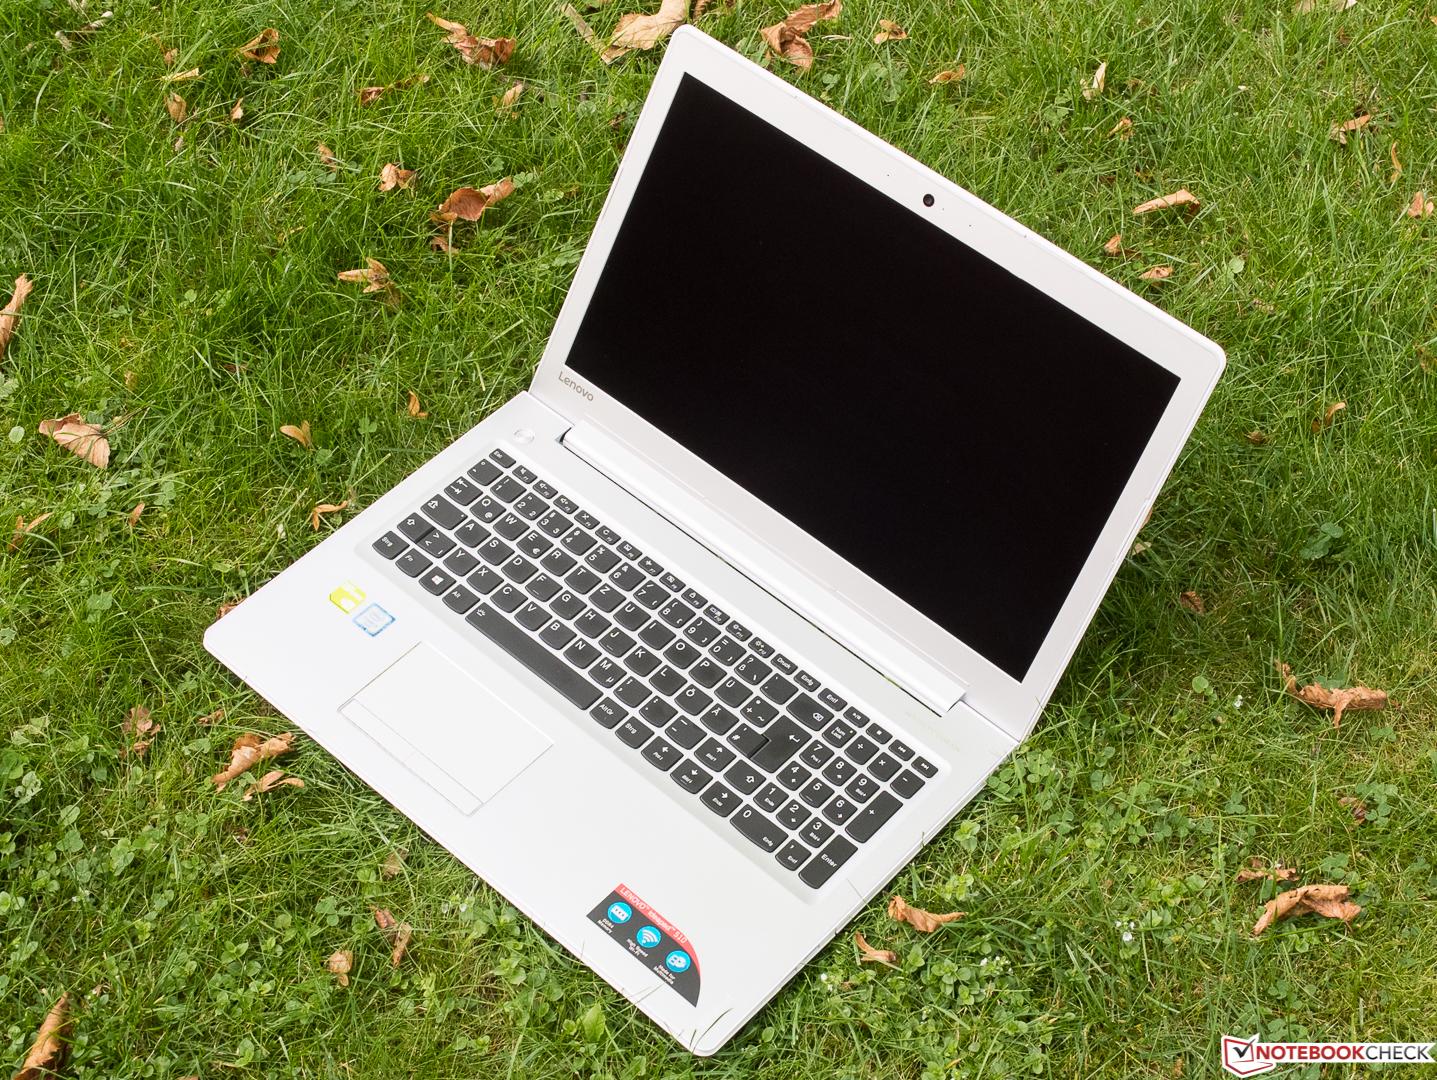 Ноутбук Lenovo IdeaPad Y520-15IKBN 80WK002MRK (Intel Core i7-7700HQ 2.8 GHz/8192Mb/1000Gb/nVidia GeForce GTX 1050 2048Mb/Wi-Fi/Bluetooth/Cam/15.6/1920x1080/Windows 10 64-bit)